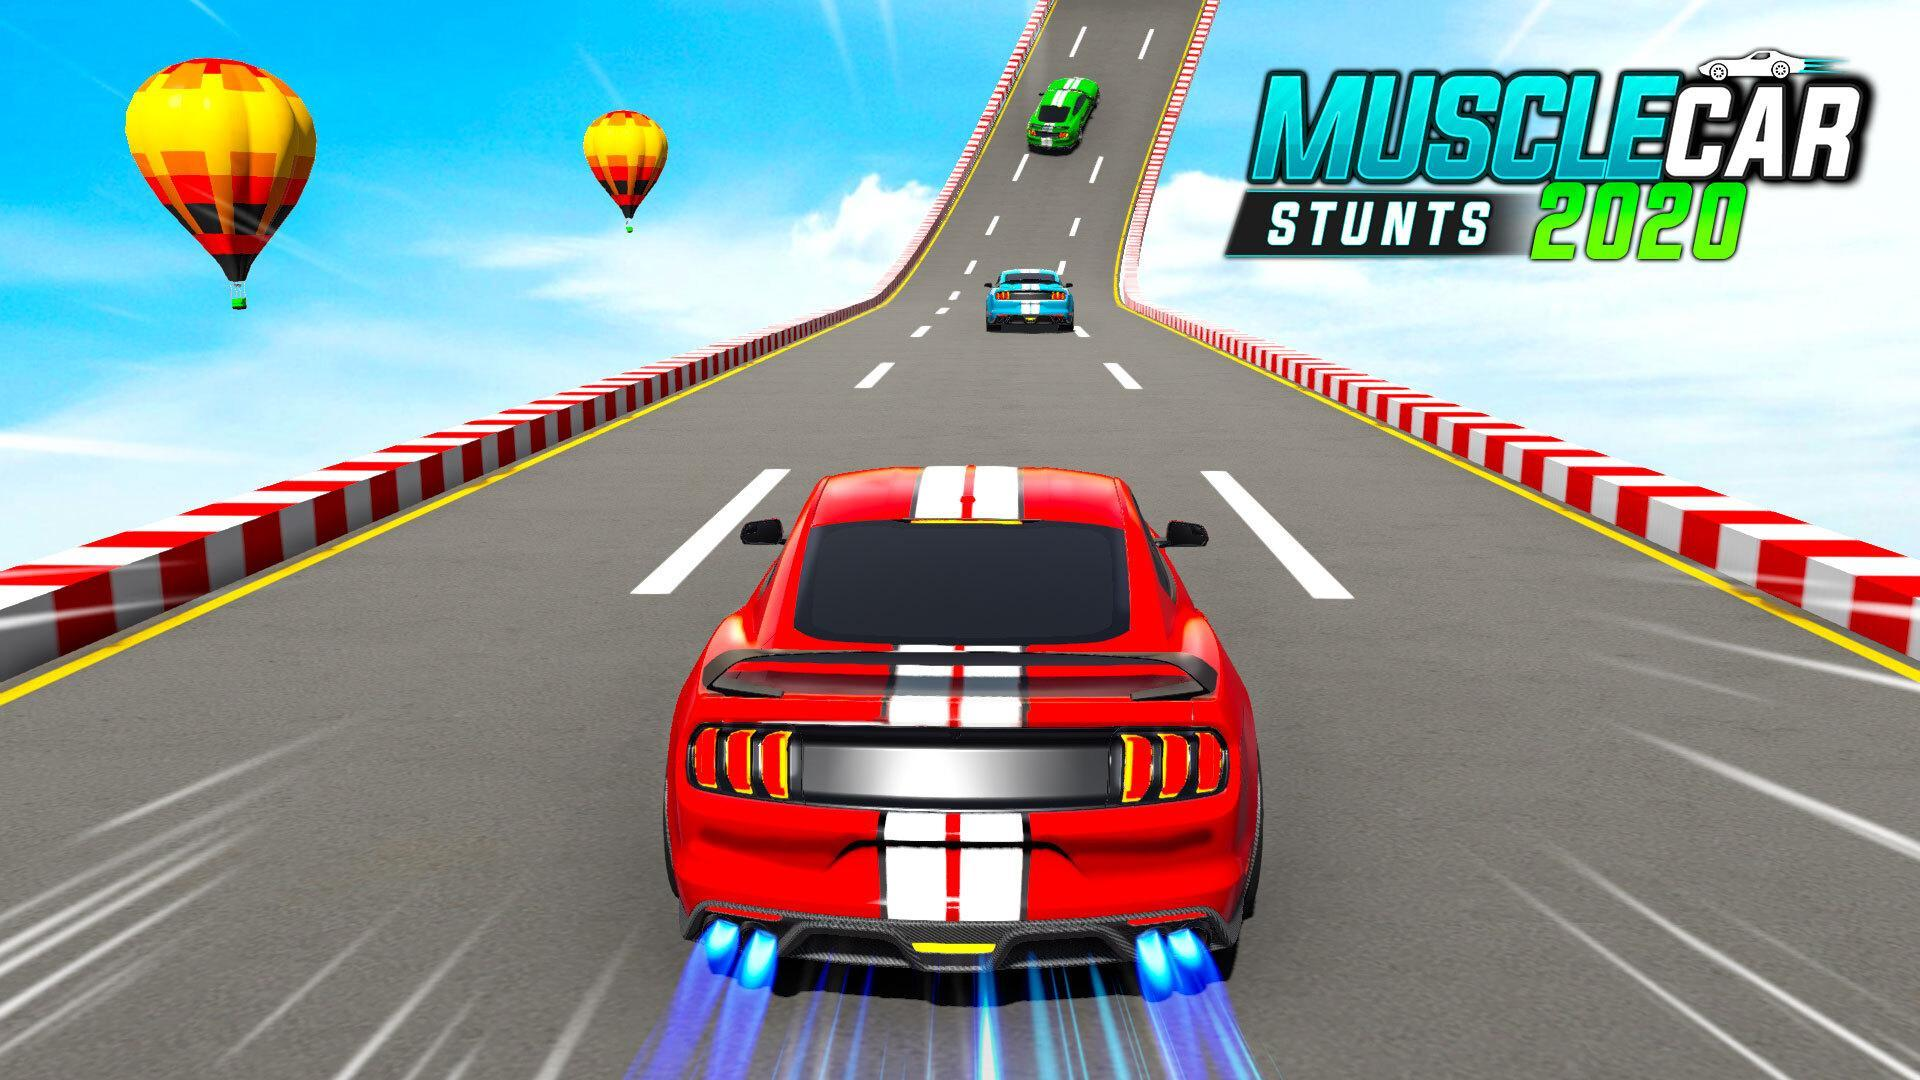 Muscle Car Stunts 2020 Mega Ramp Stunt Car Games 1.0.9 Screenshot 9